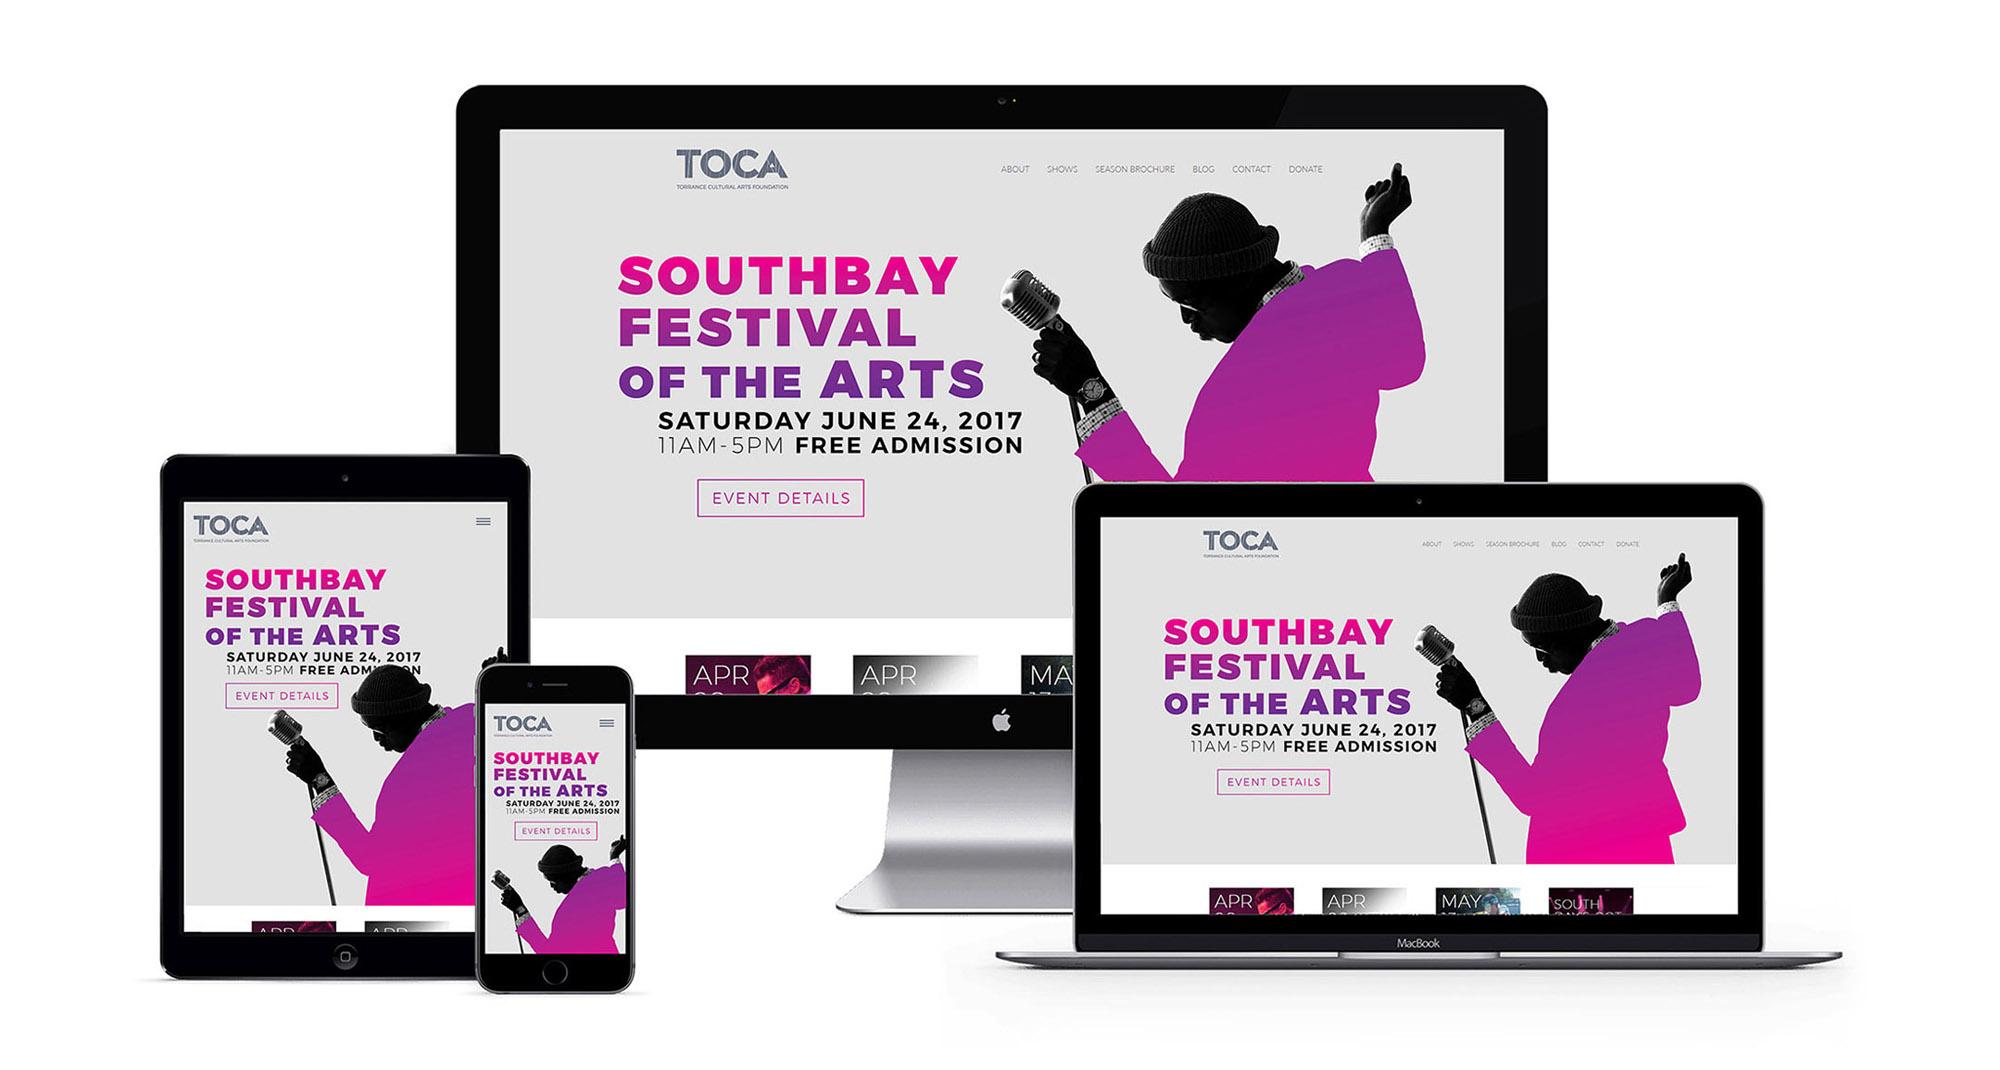 TOCA Southbay Festival of the Arts Web Design